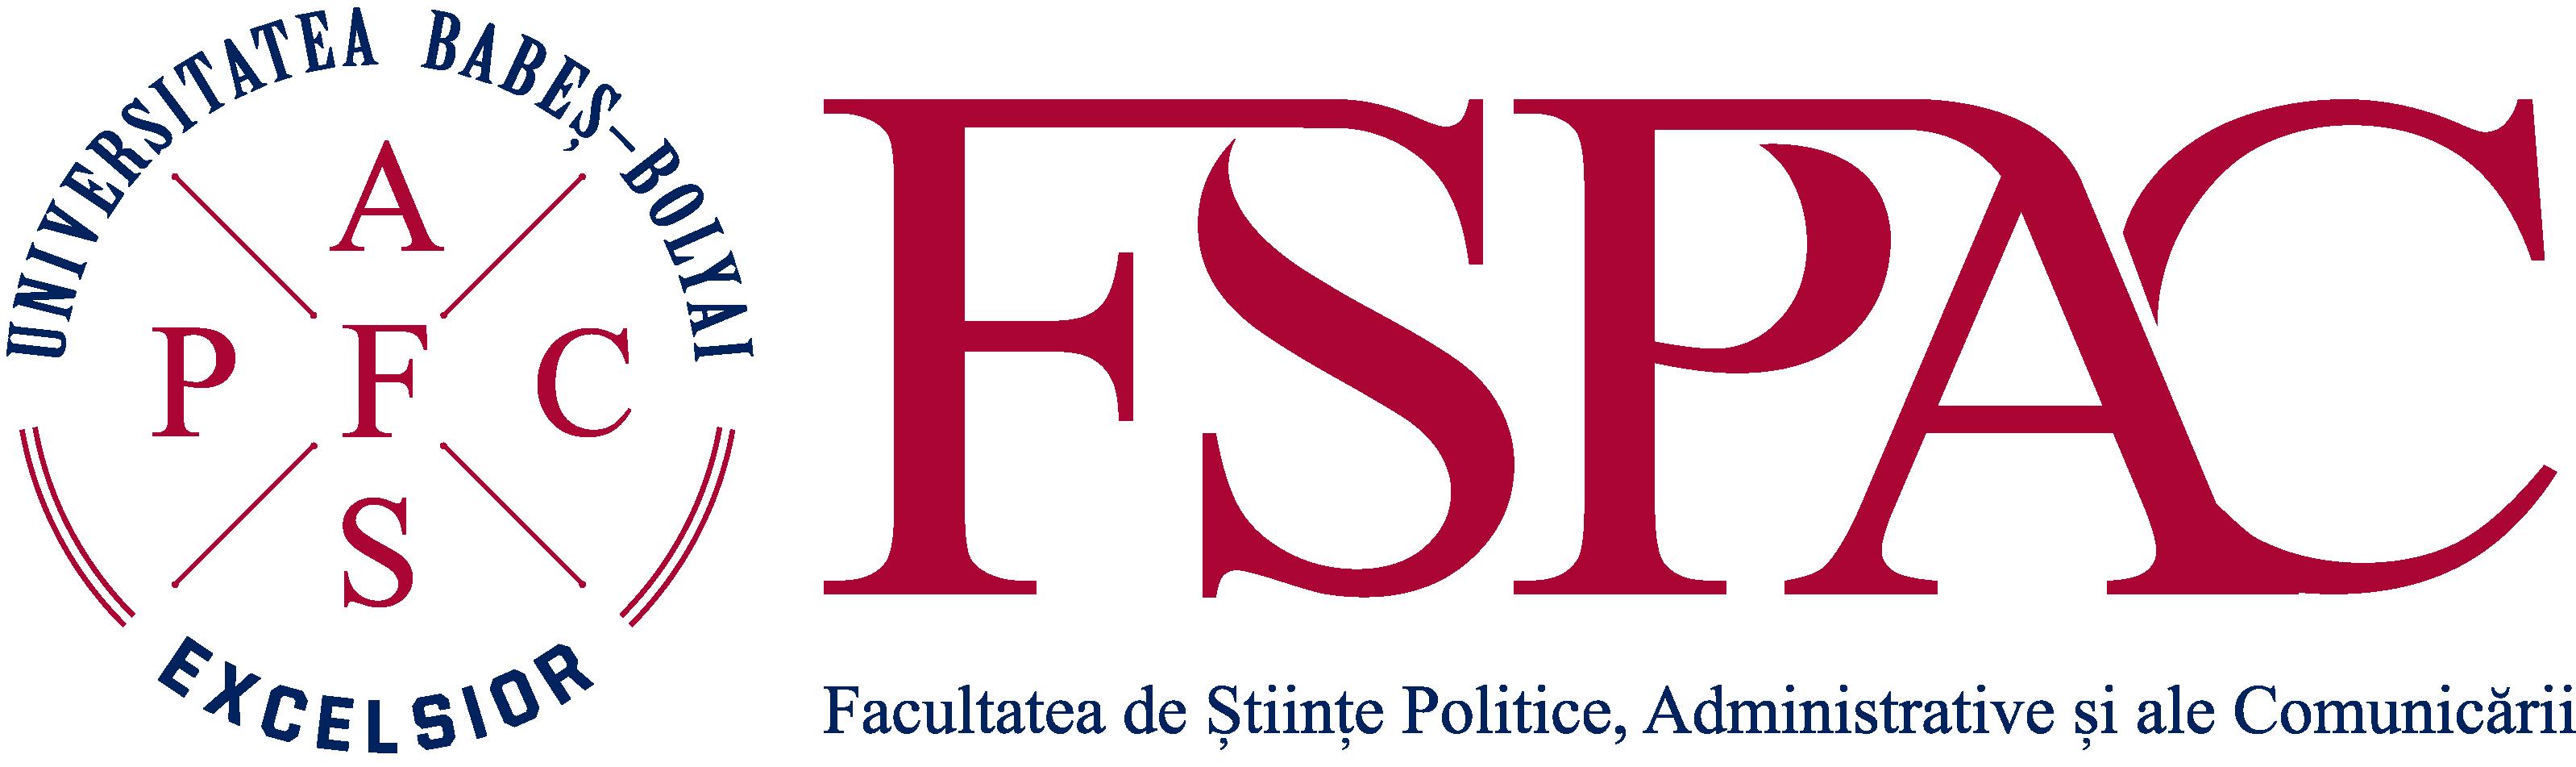 Administrație și Management Public, FSPAC, UBB